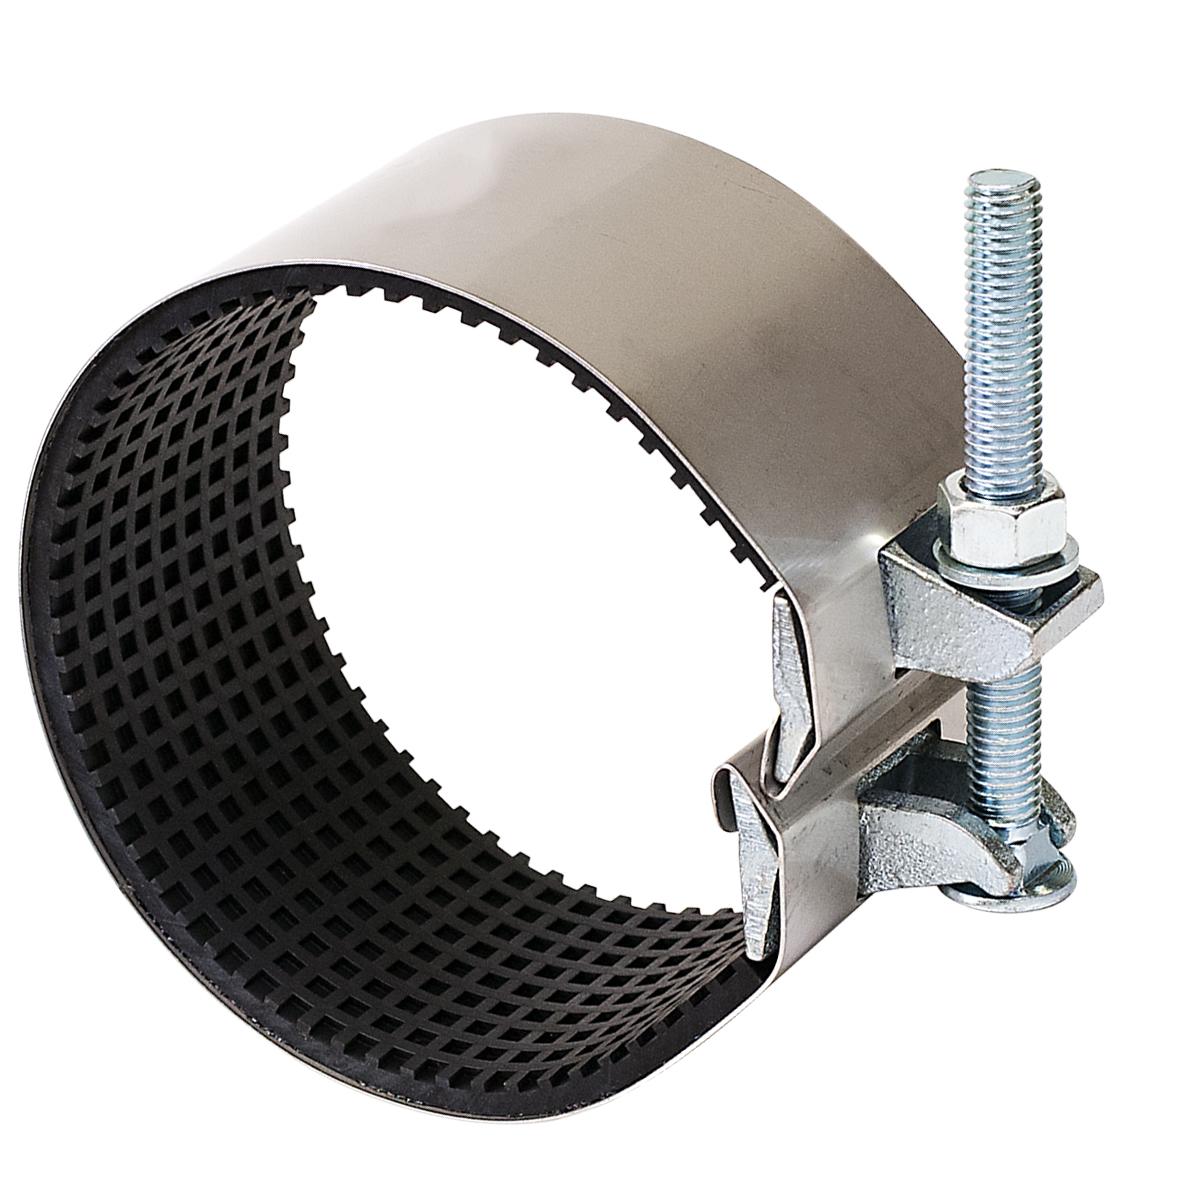 SC - Stainless steel repair clamp